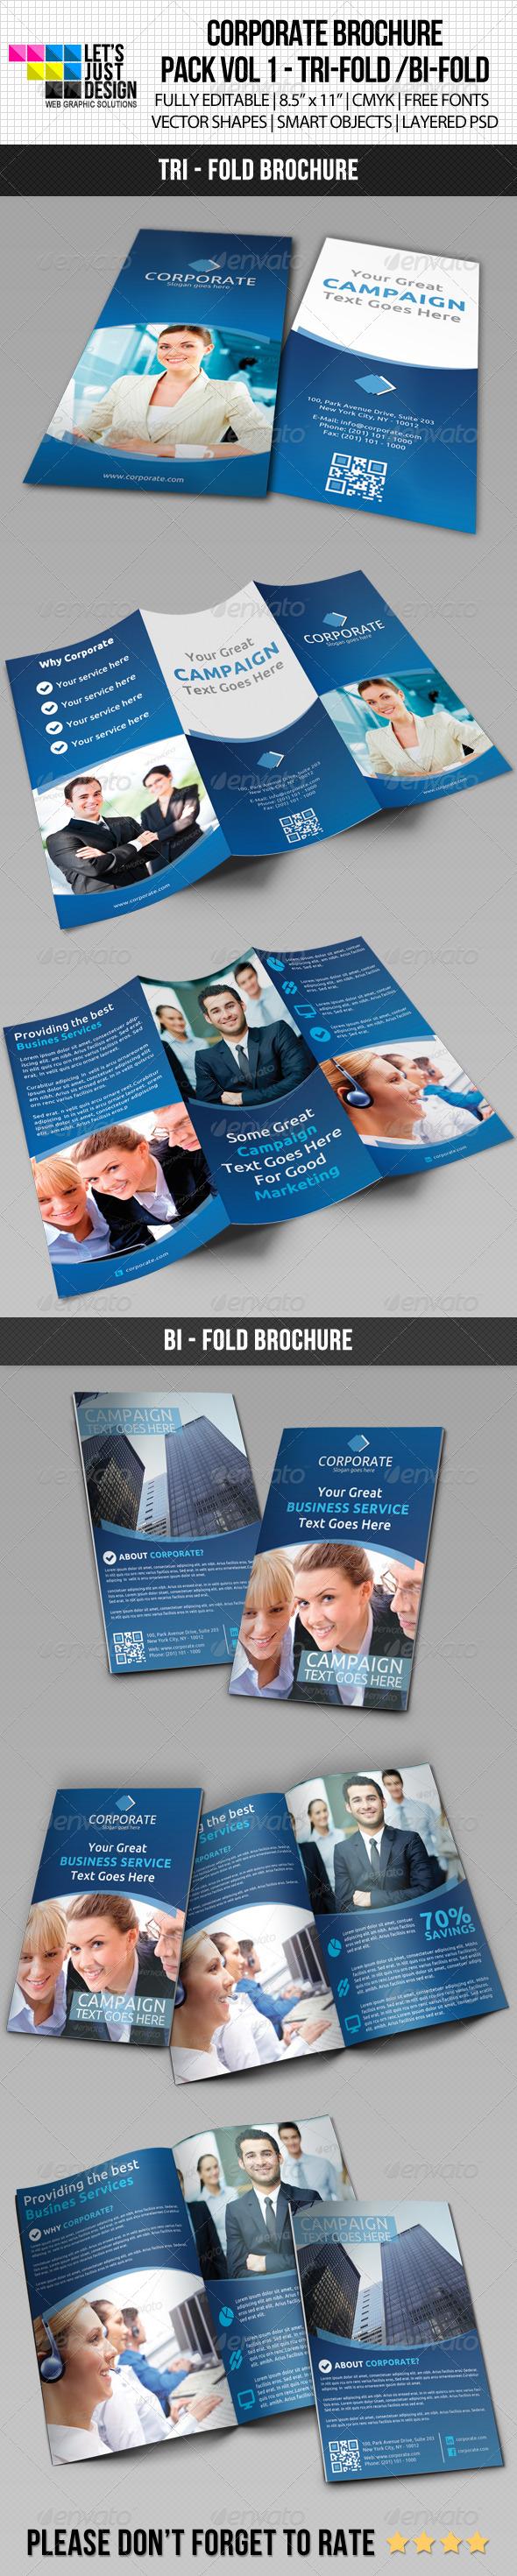 GraphicRiver Corporate Brochure Pack Vol 1 5897224